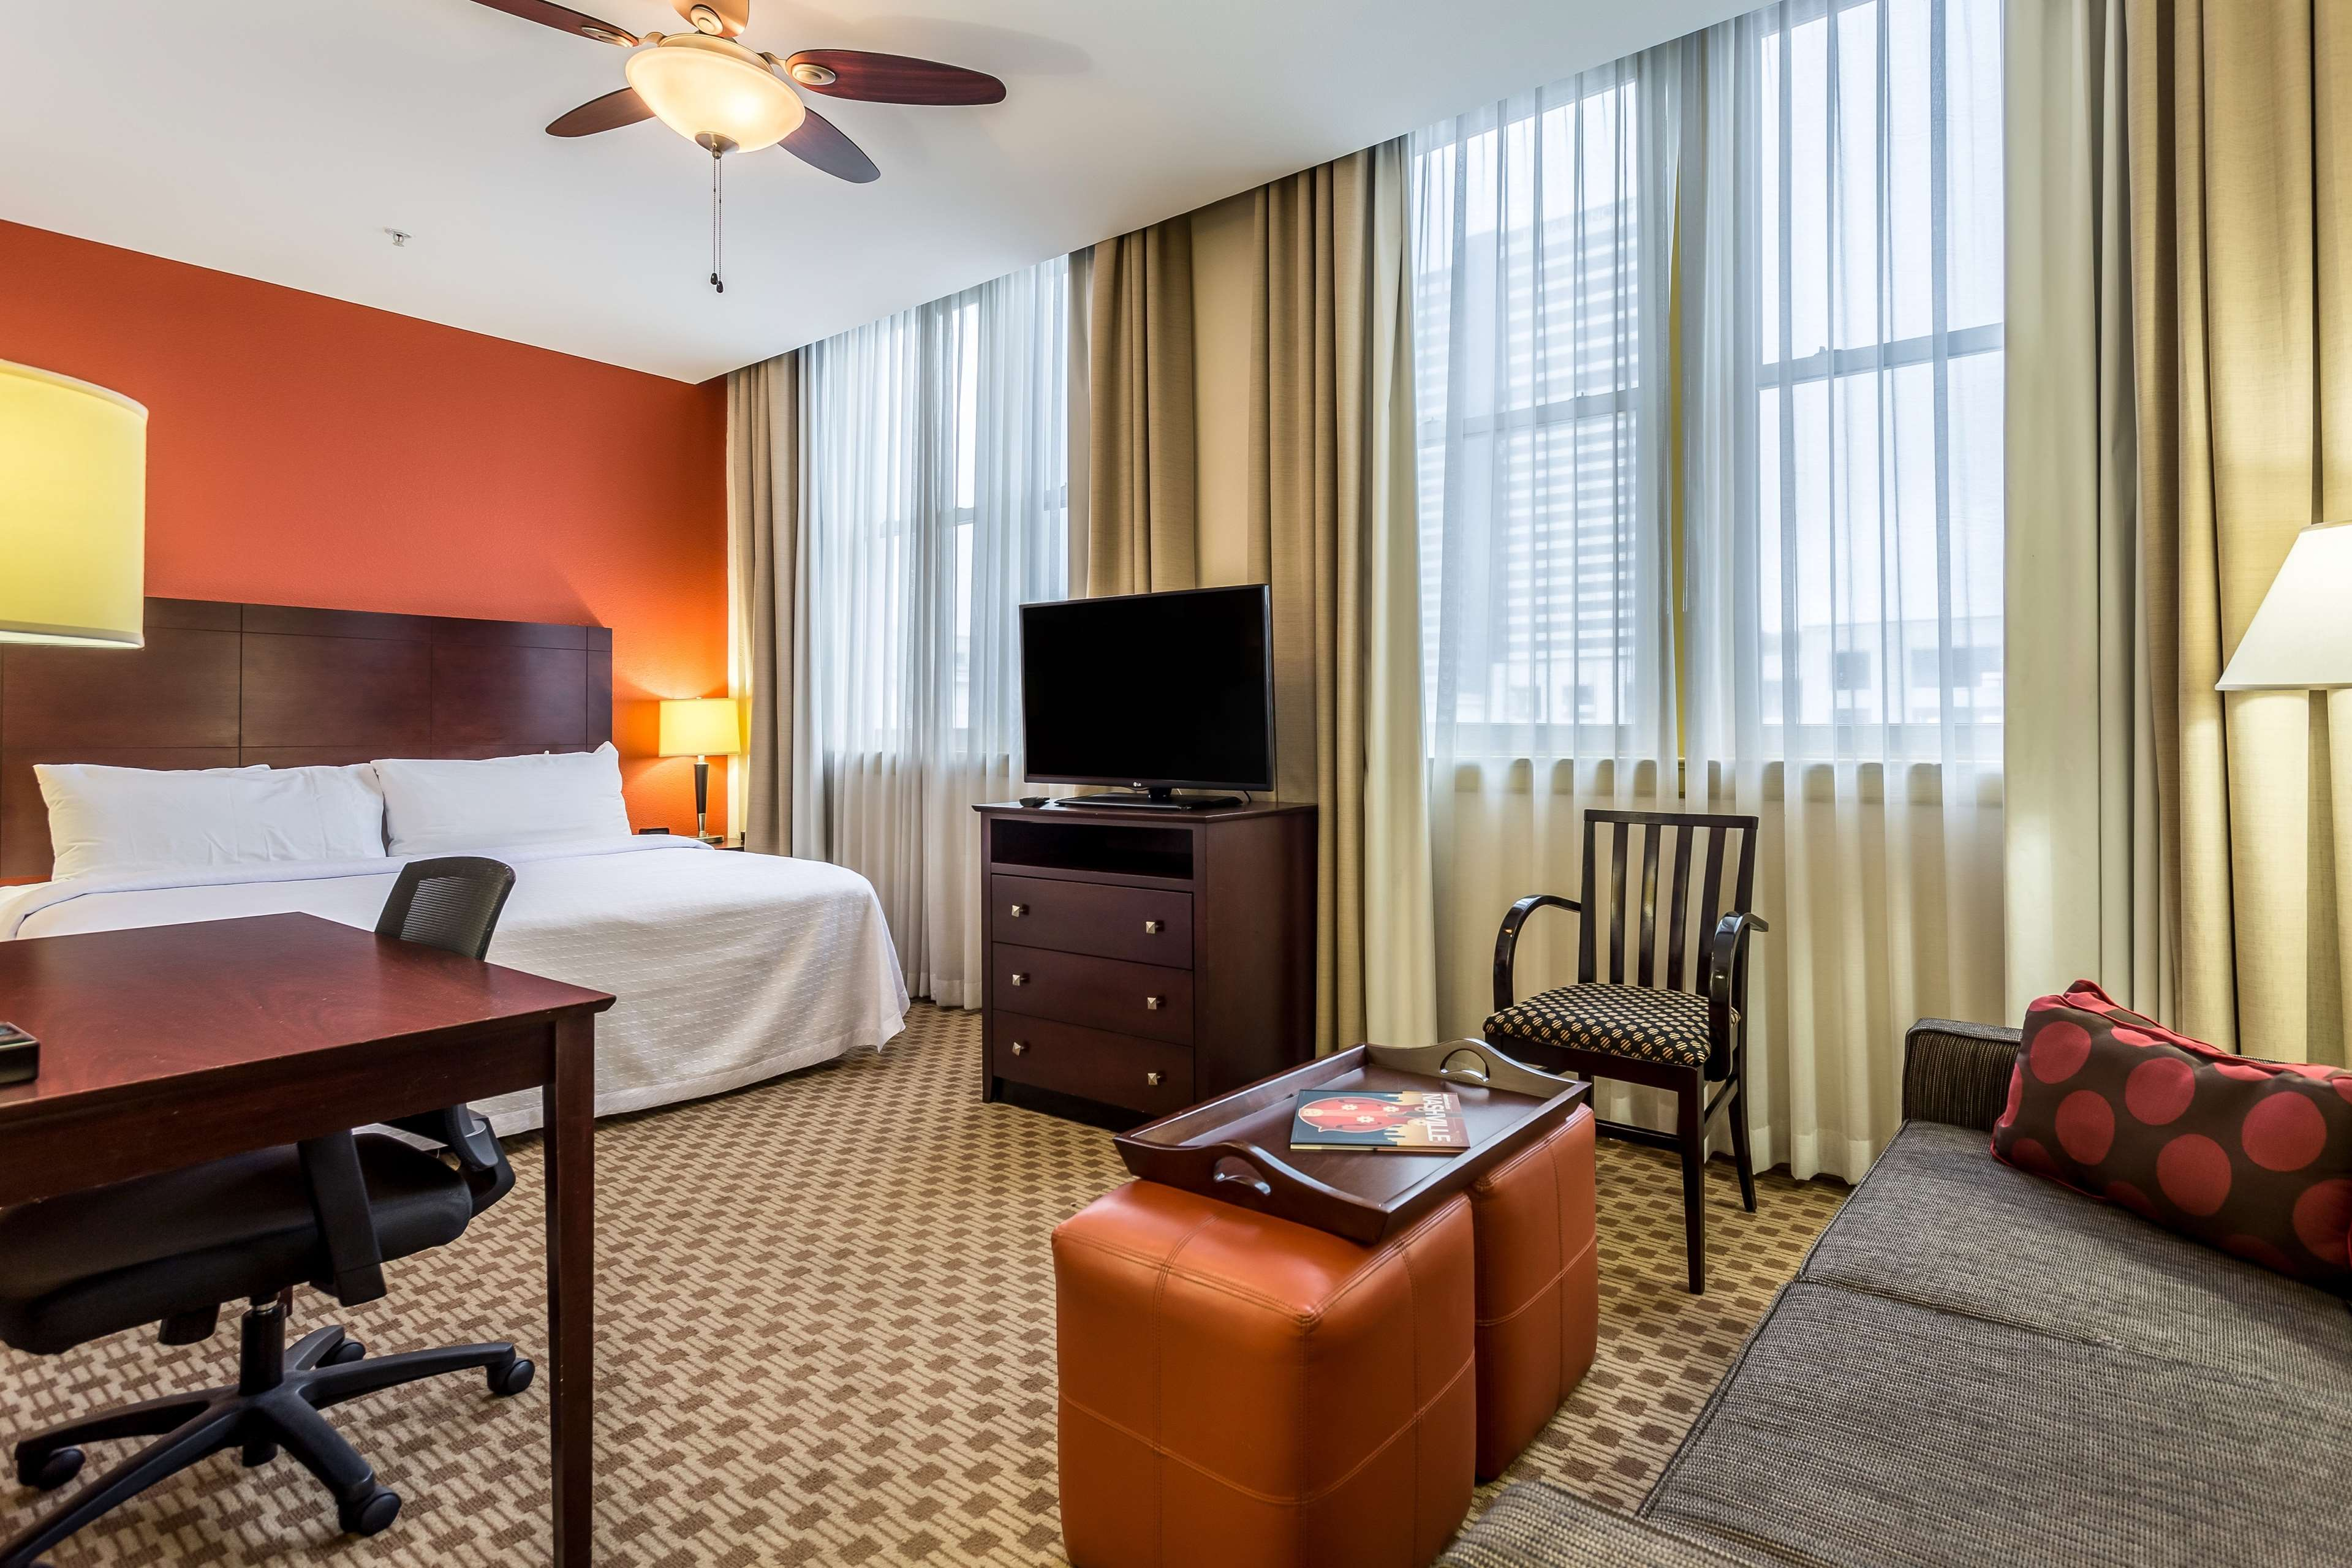 Homewood Suites by Hilton Nashville-Downtown image 17